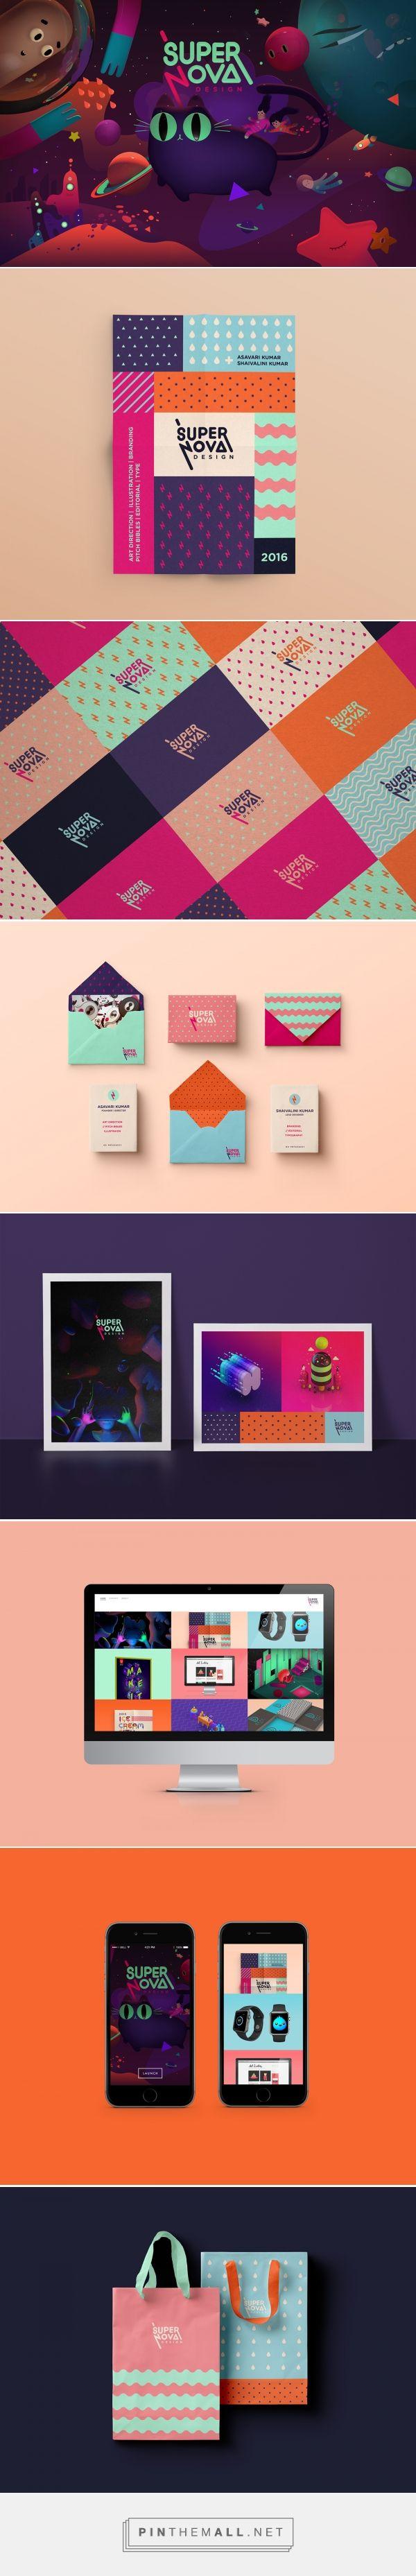 Supernova Design Self Branding | Fivestar Branding Agency – Design and Branding Agency & Curated Inspiration Gallery